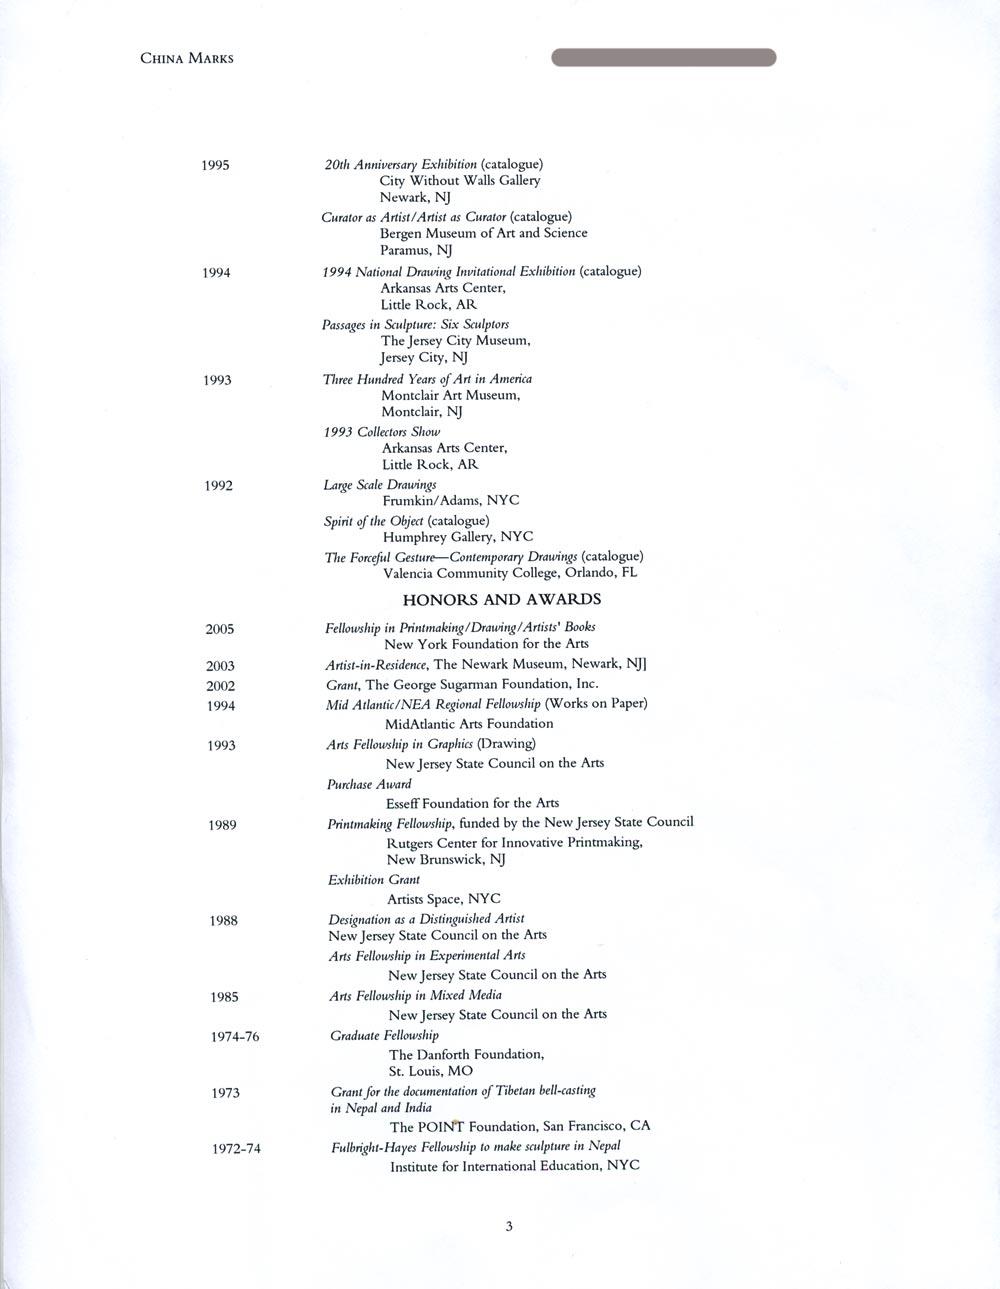 China Mark's Resume, pg 3